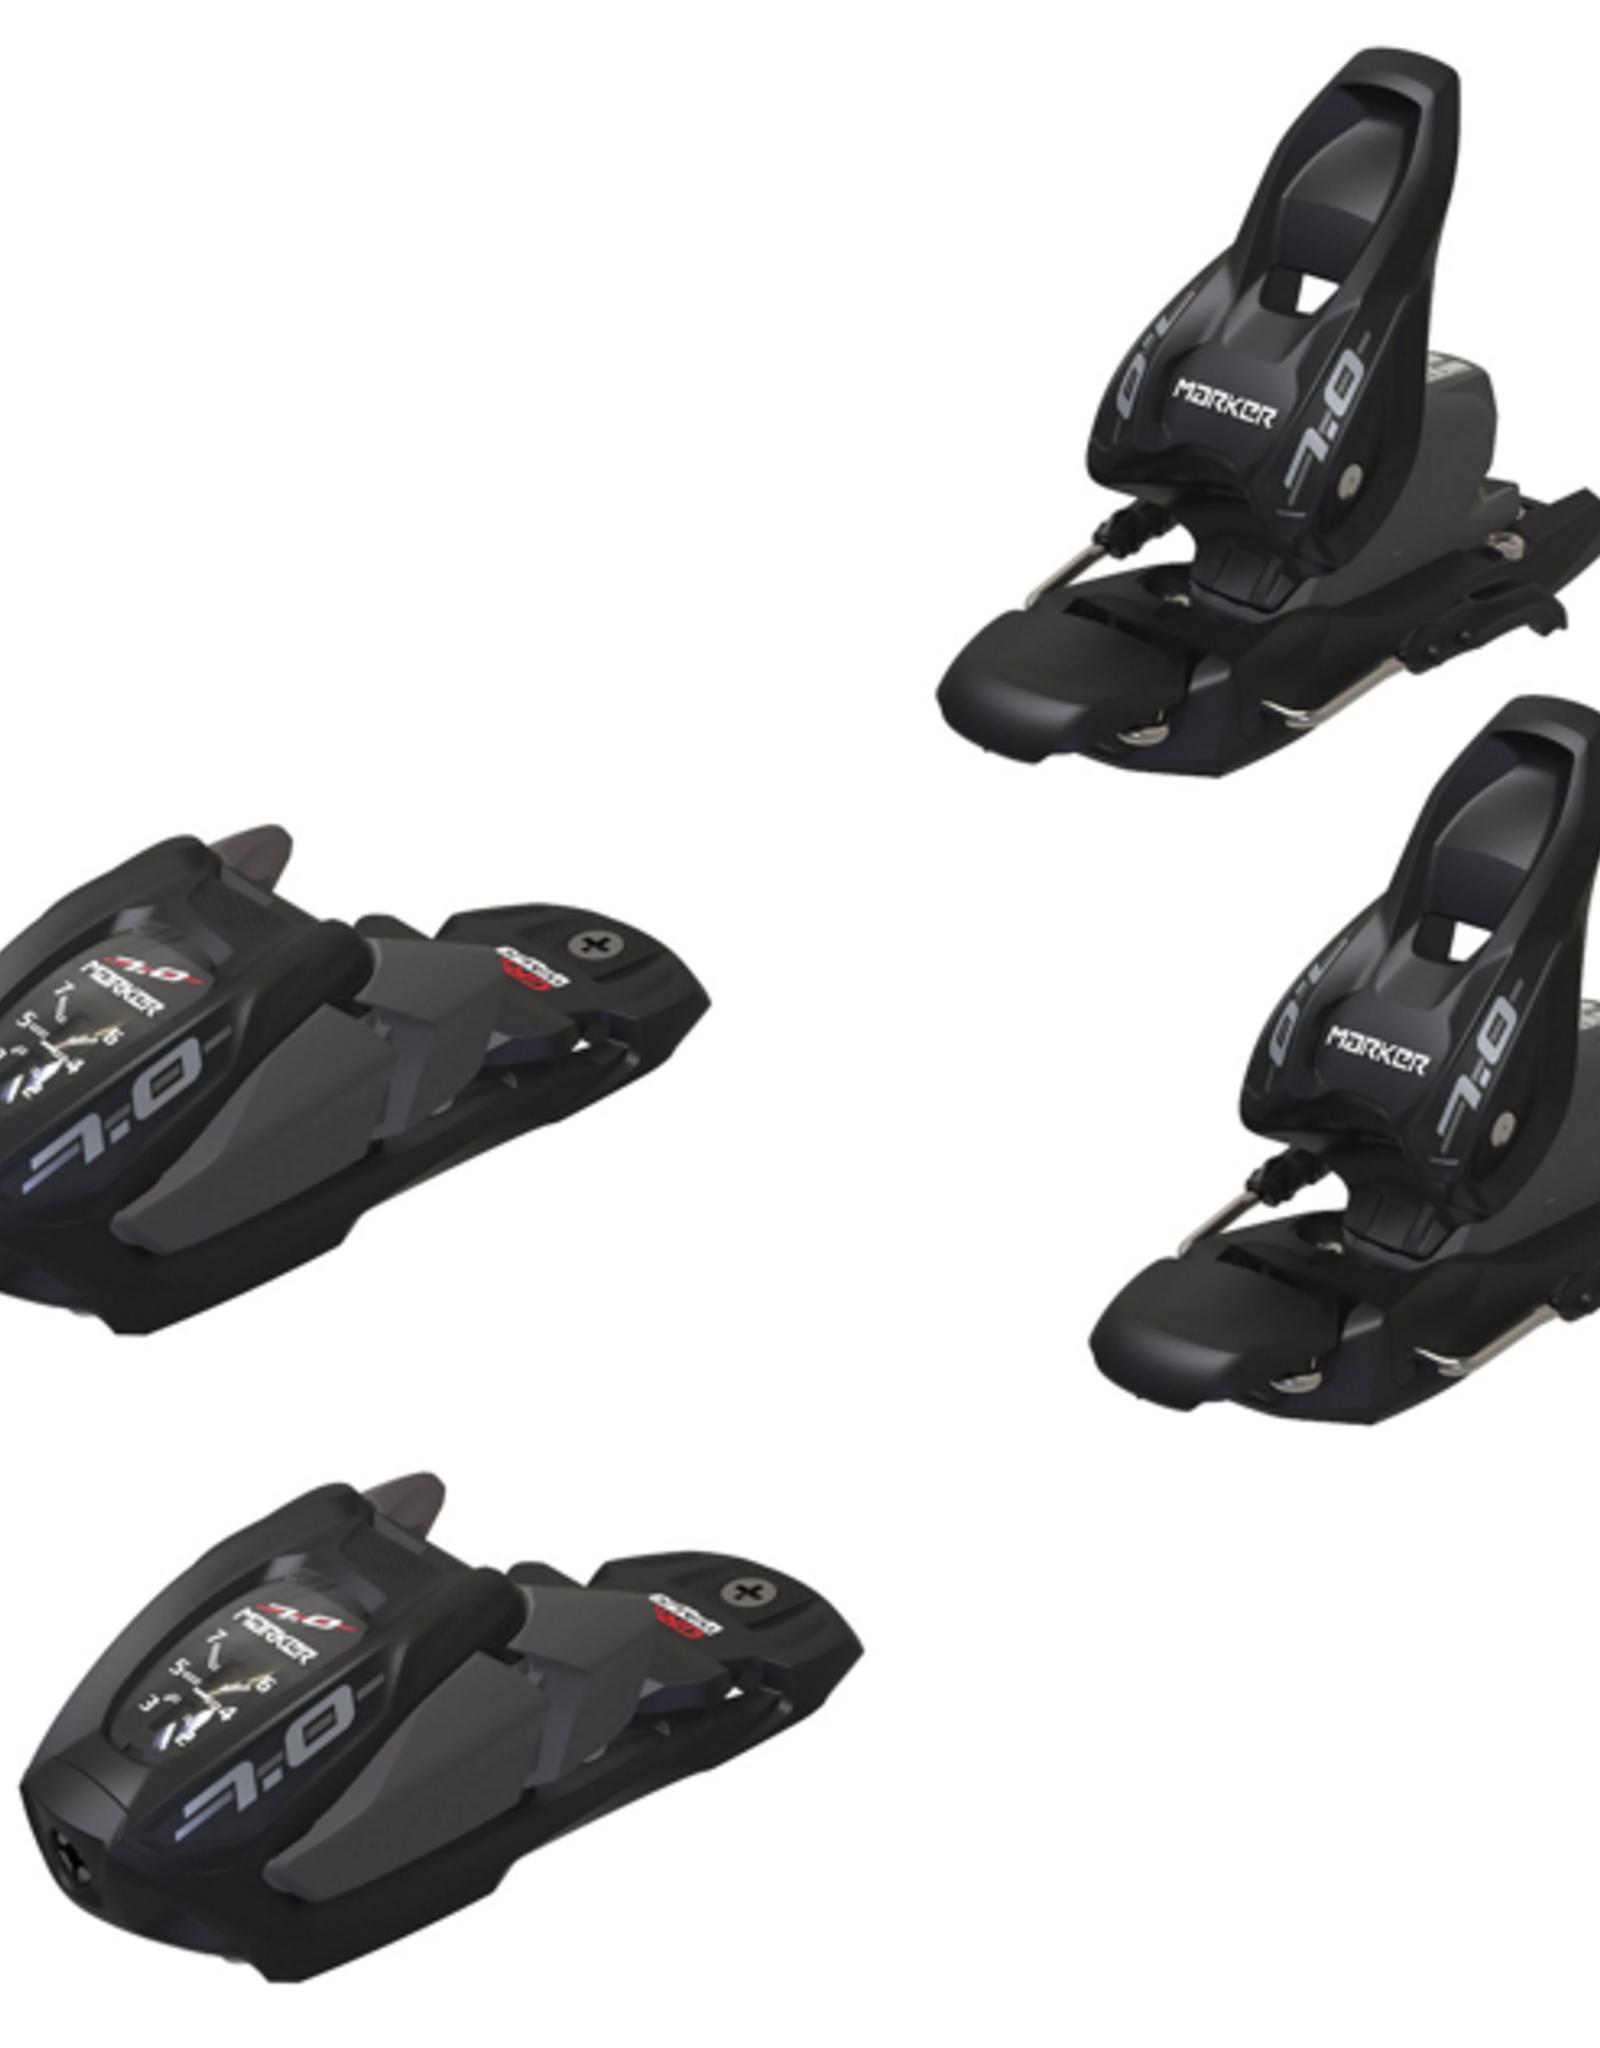 Marker 7.0 Ski Bindings Black/Anthracite 2022